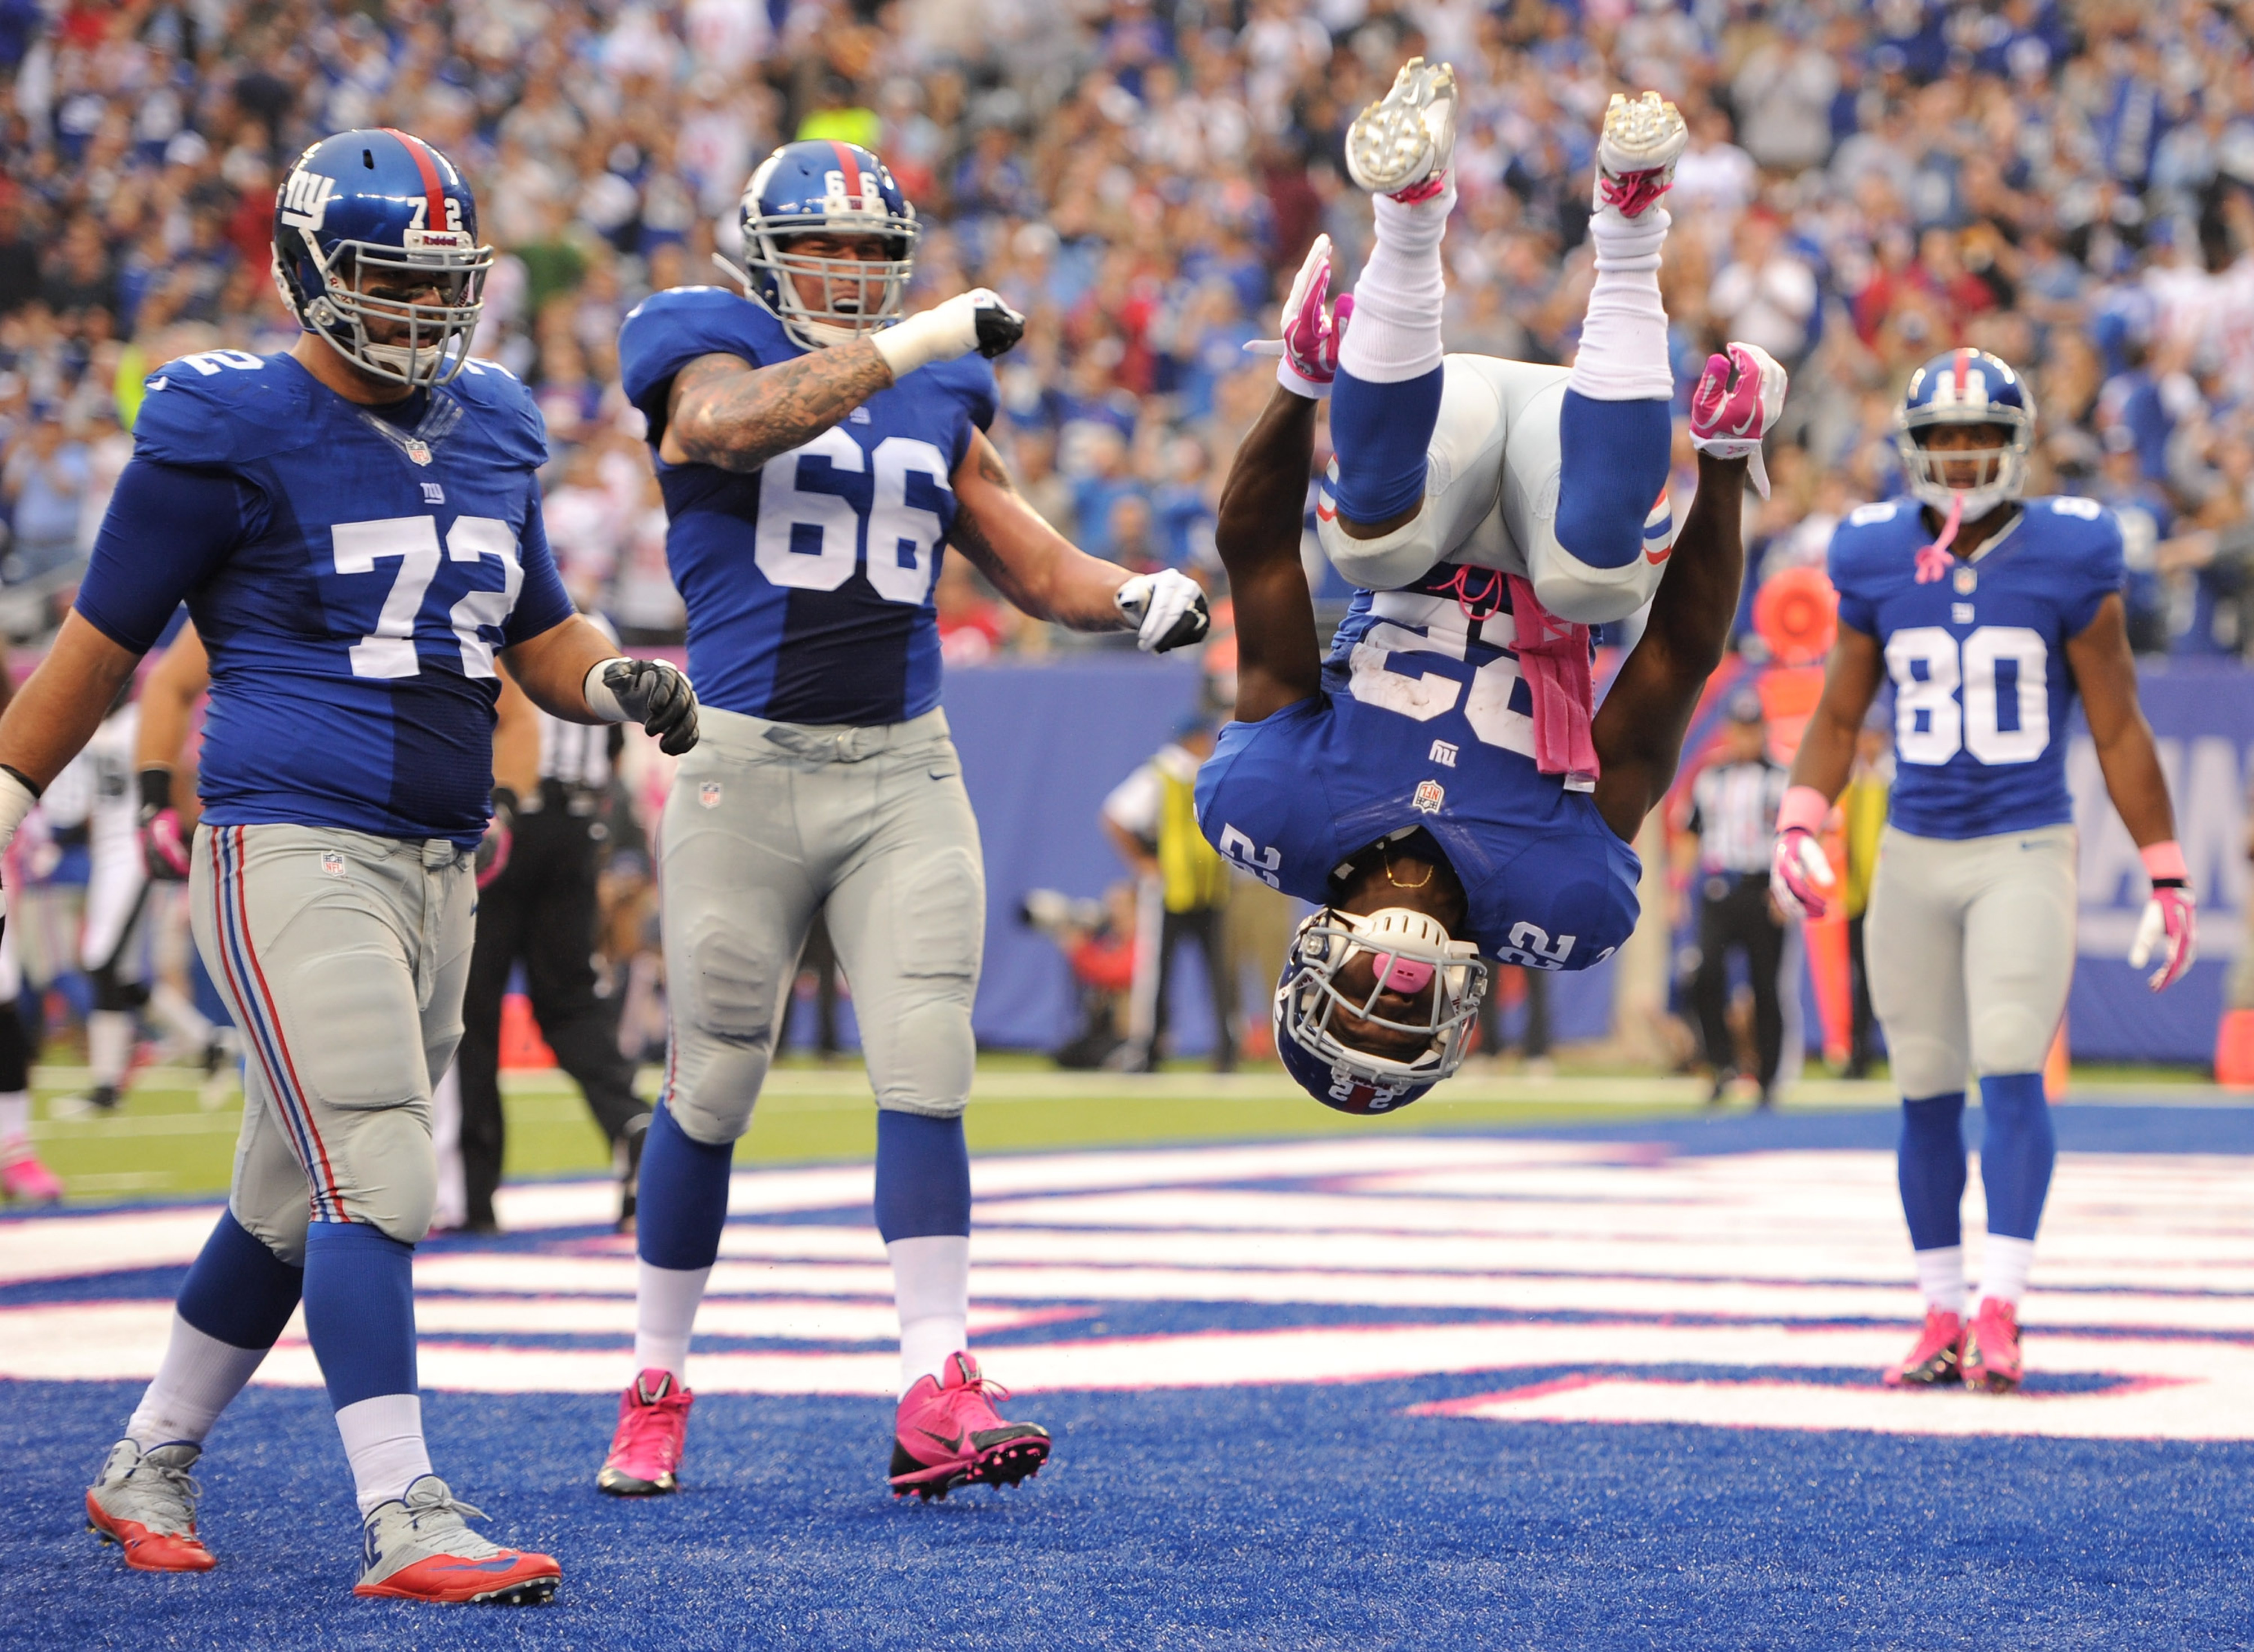 David Wilson injury: Giants RB will not play vs. Bears